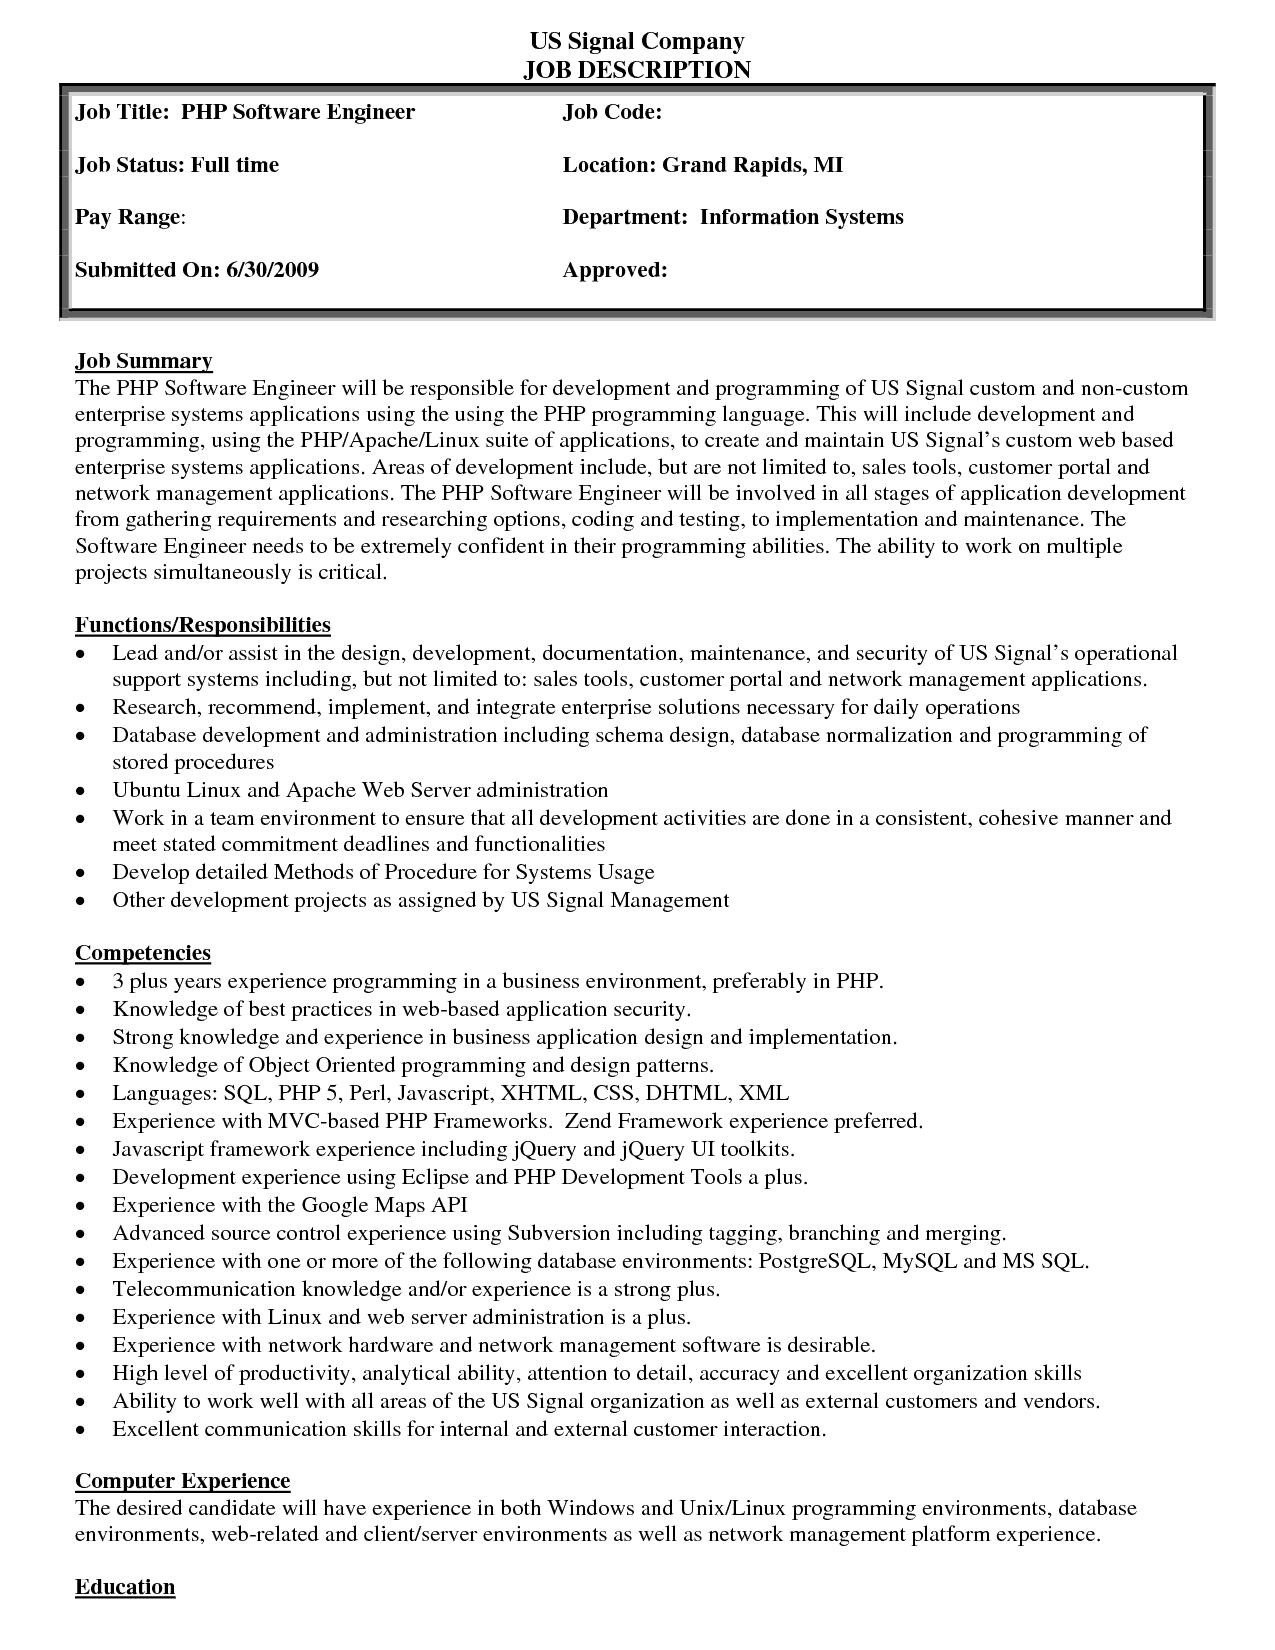 19 Free Job Description Templates In Word Excel